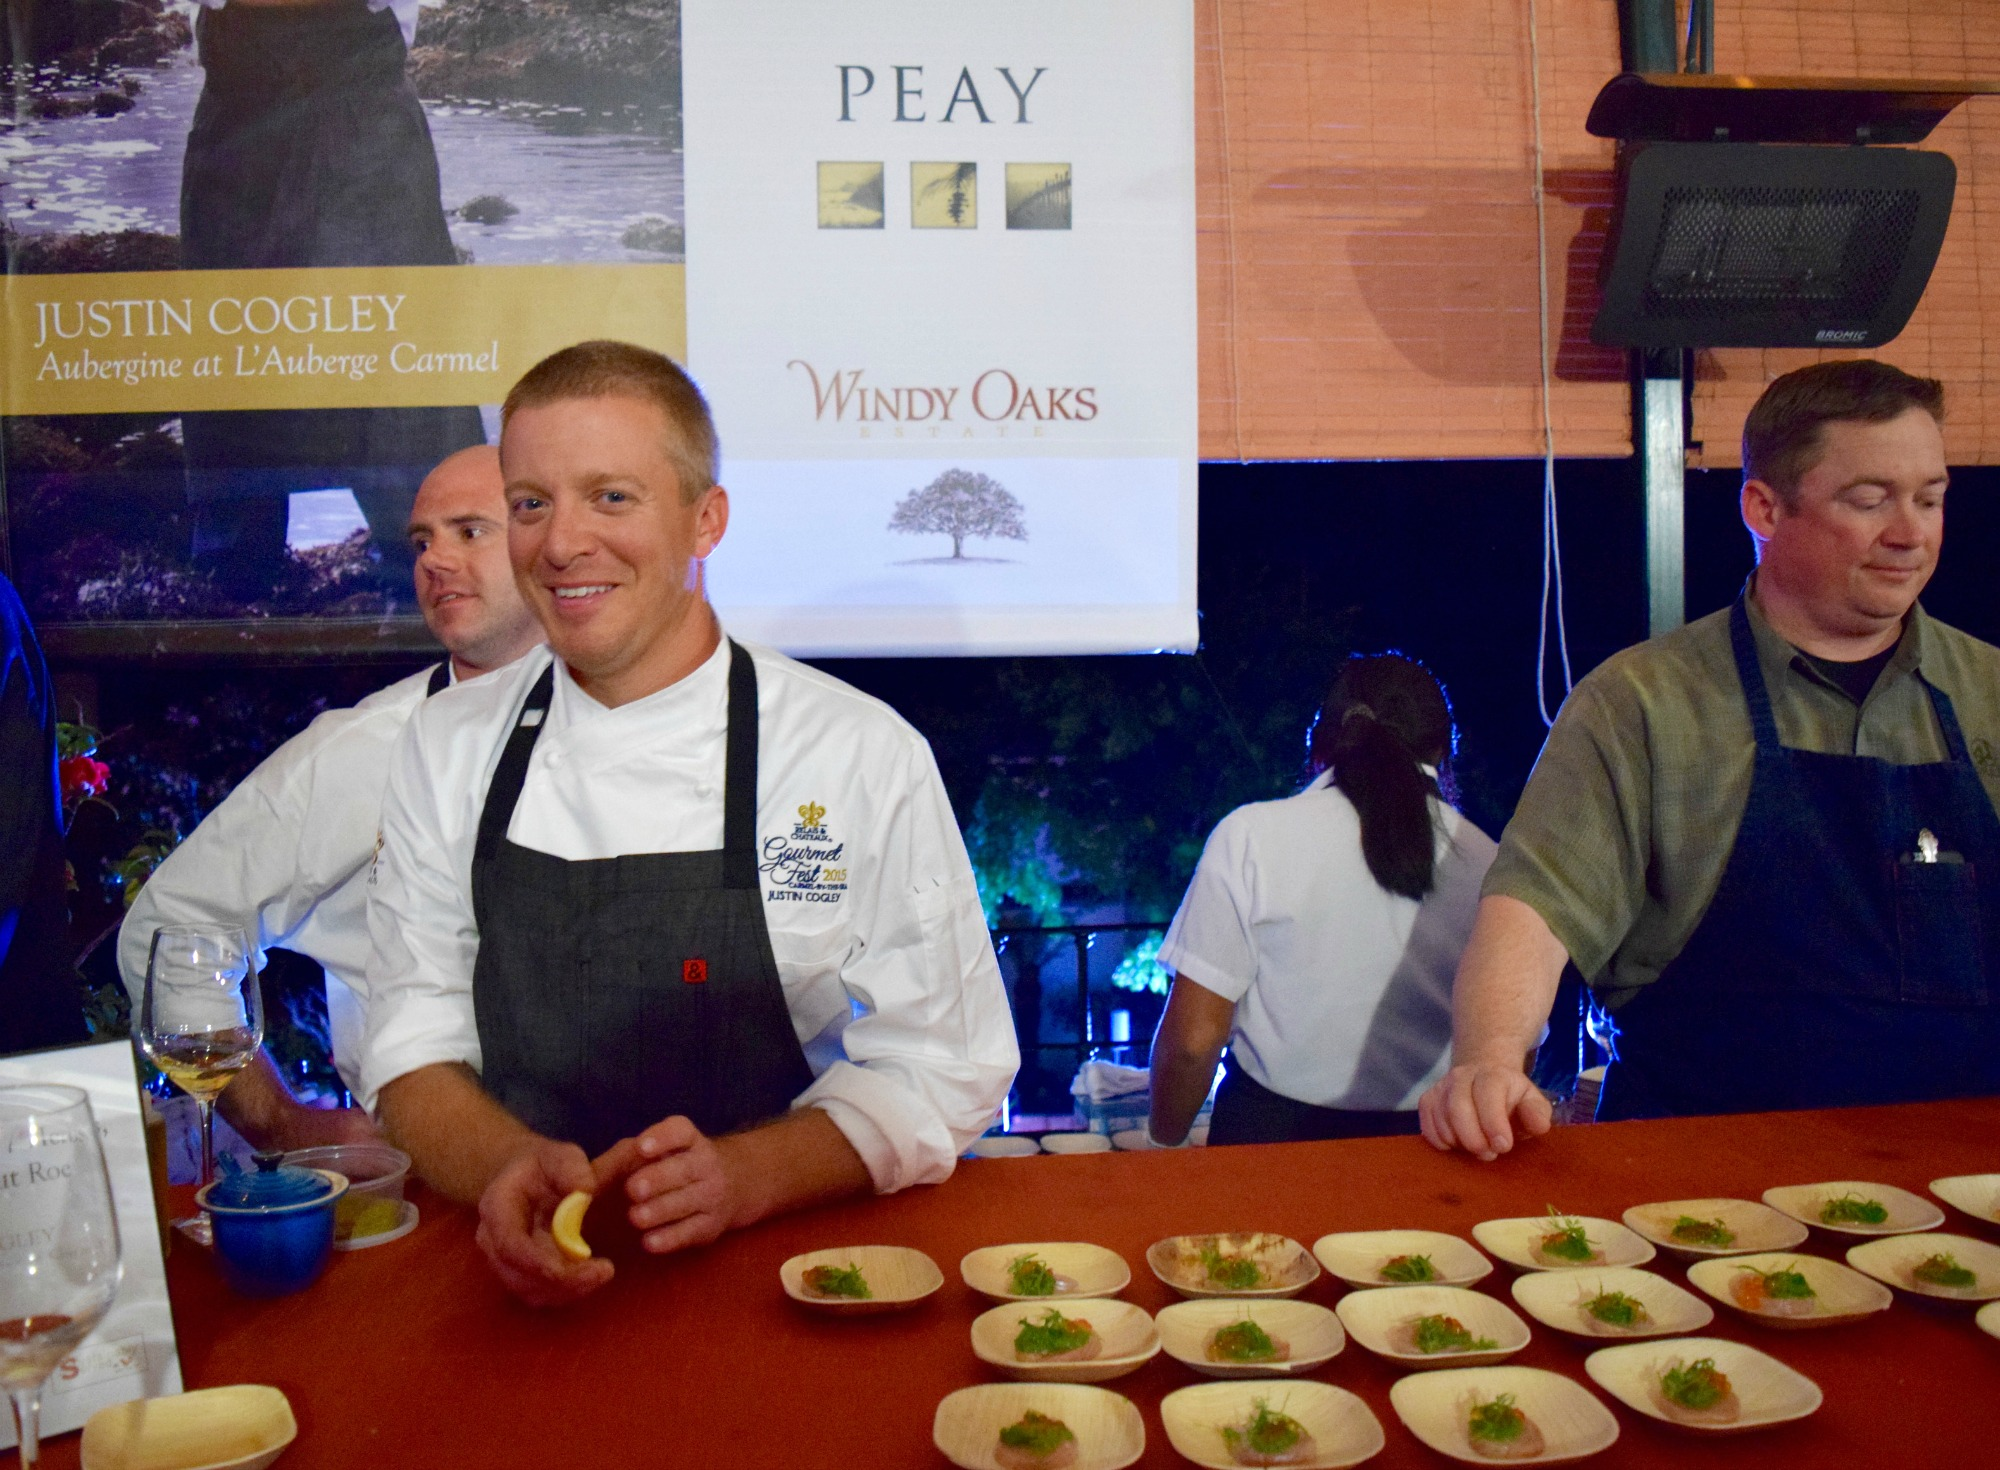 Chef Justin Cogley Aubergine Carmel Relais Chateaux